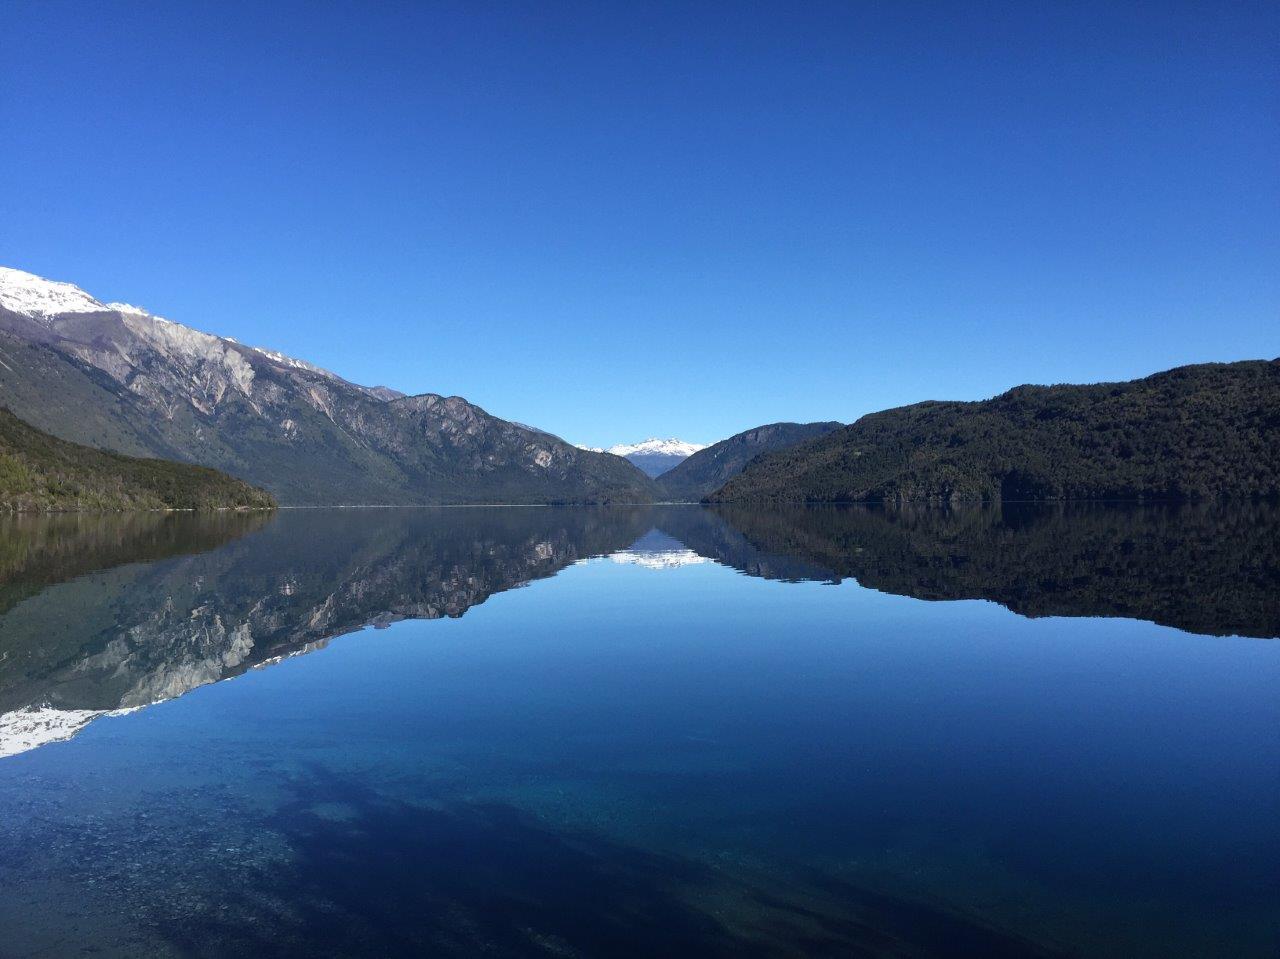 lago-azul